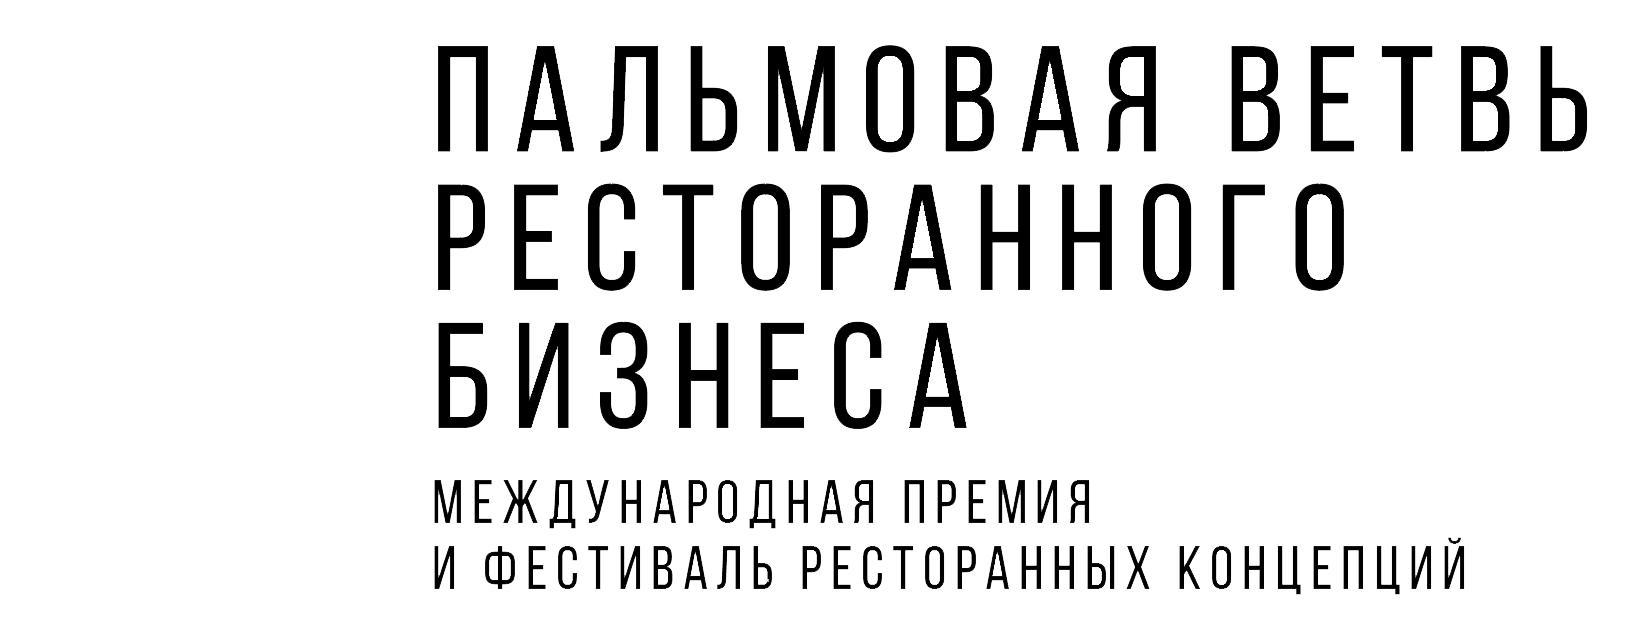 Проекты НТА